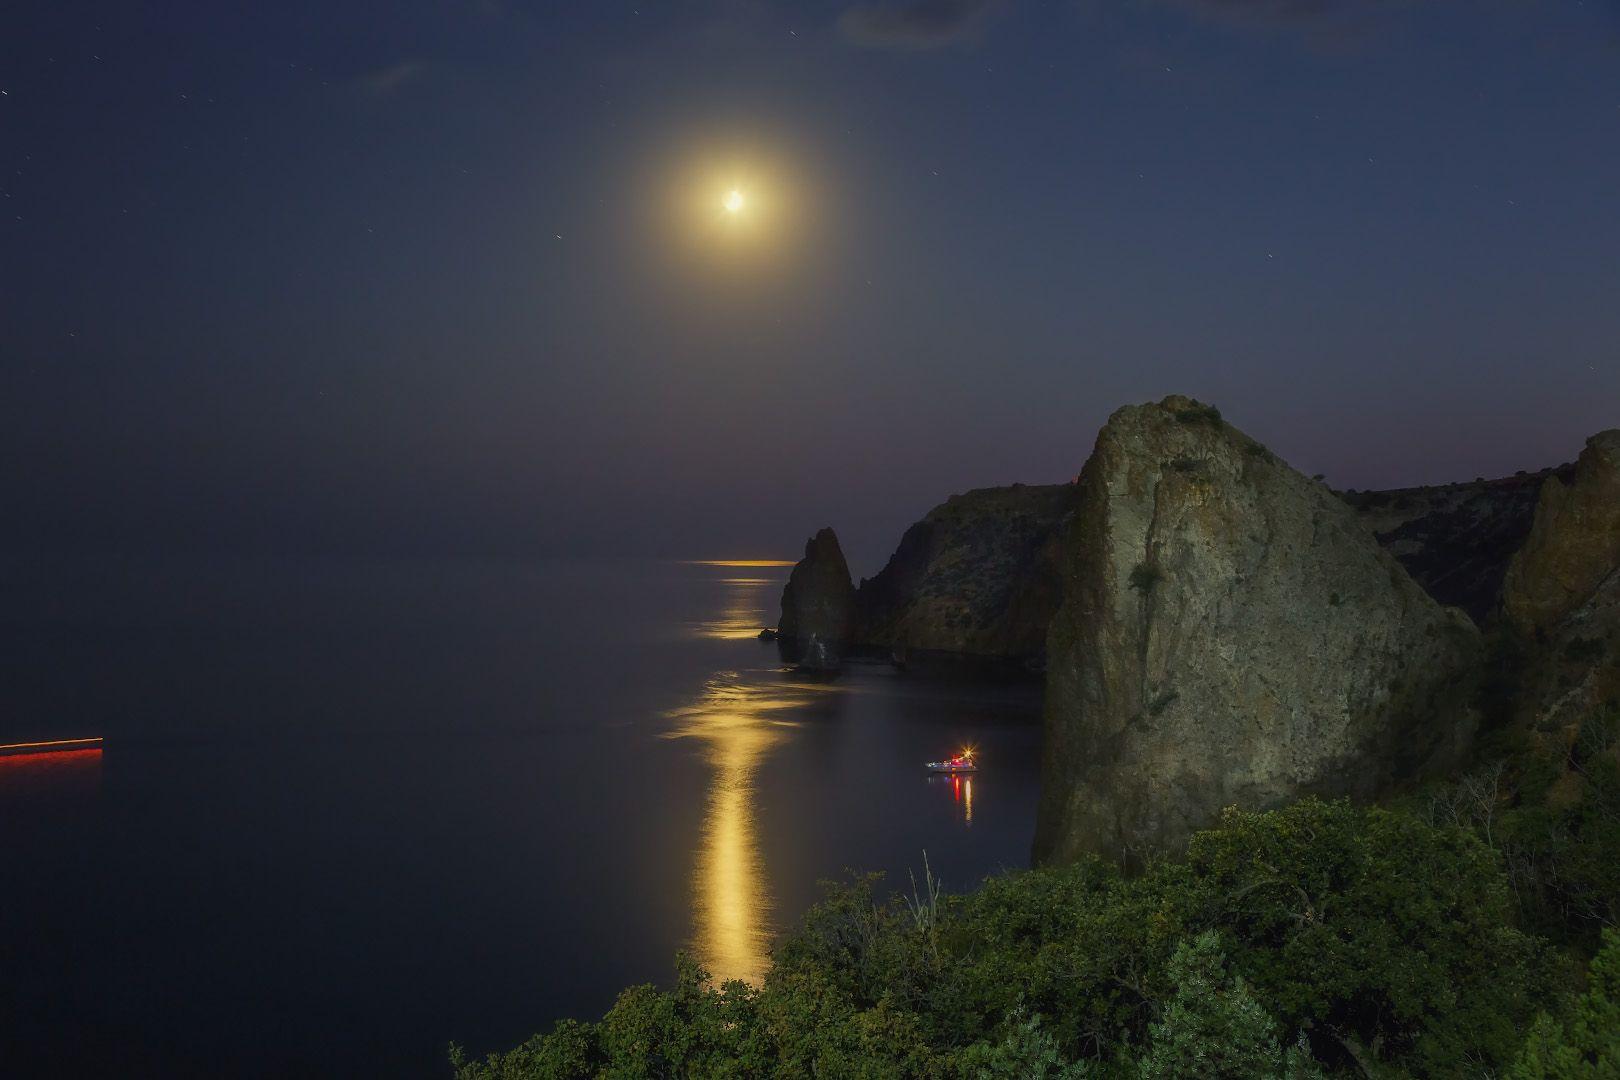 луна, вечер, море., Дубинин Владимир